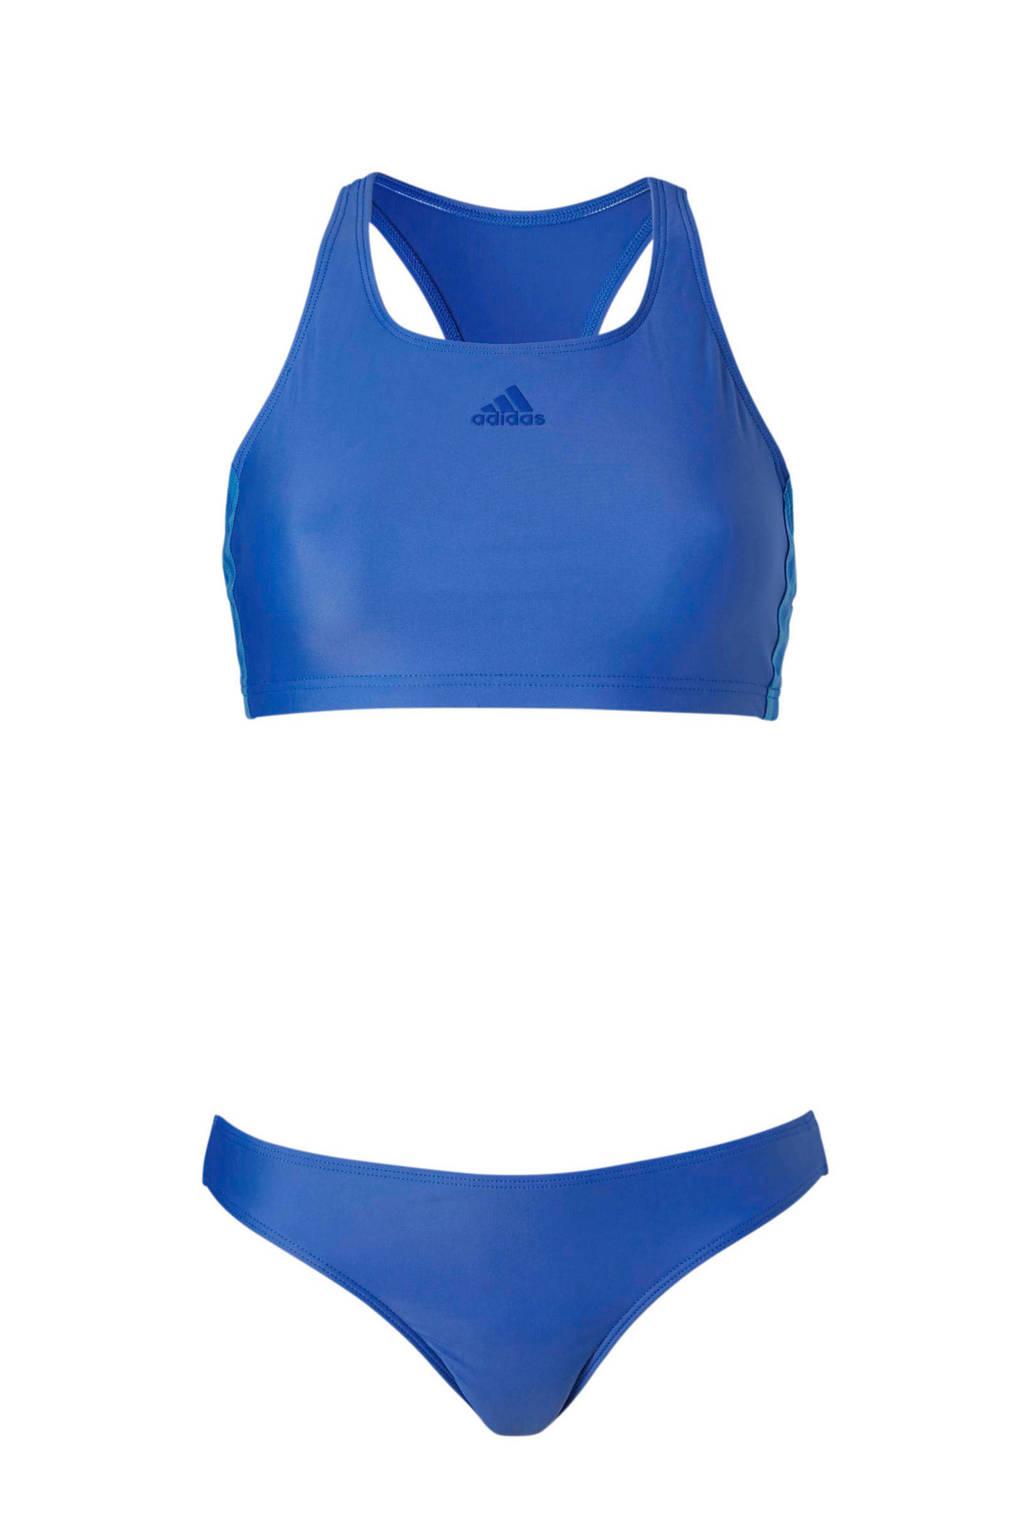 adidas performance crop bikini blauw, Blauw